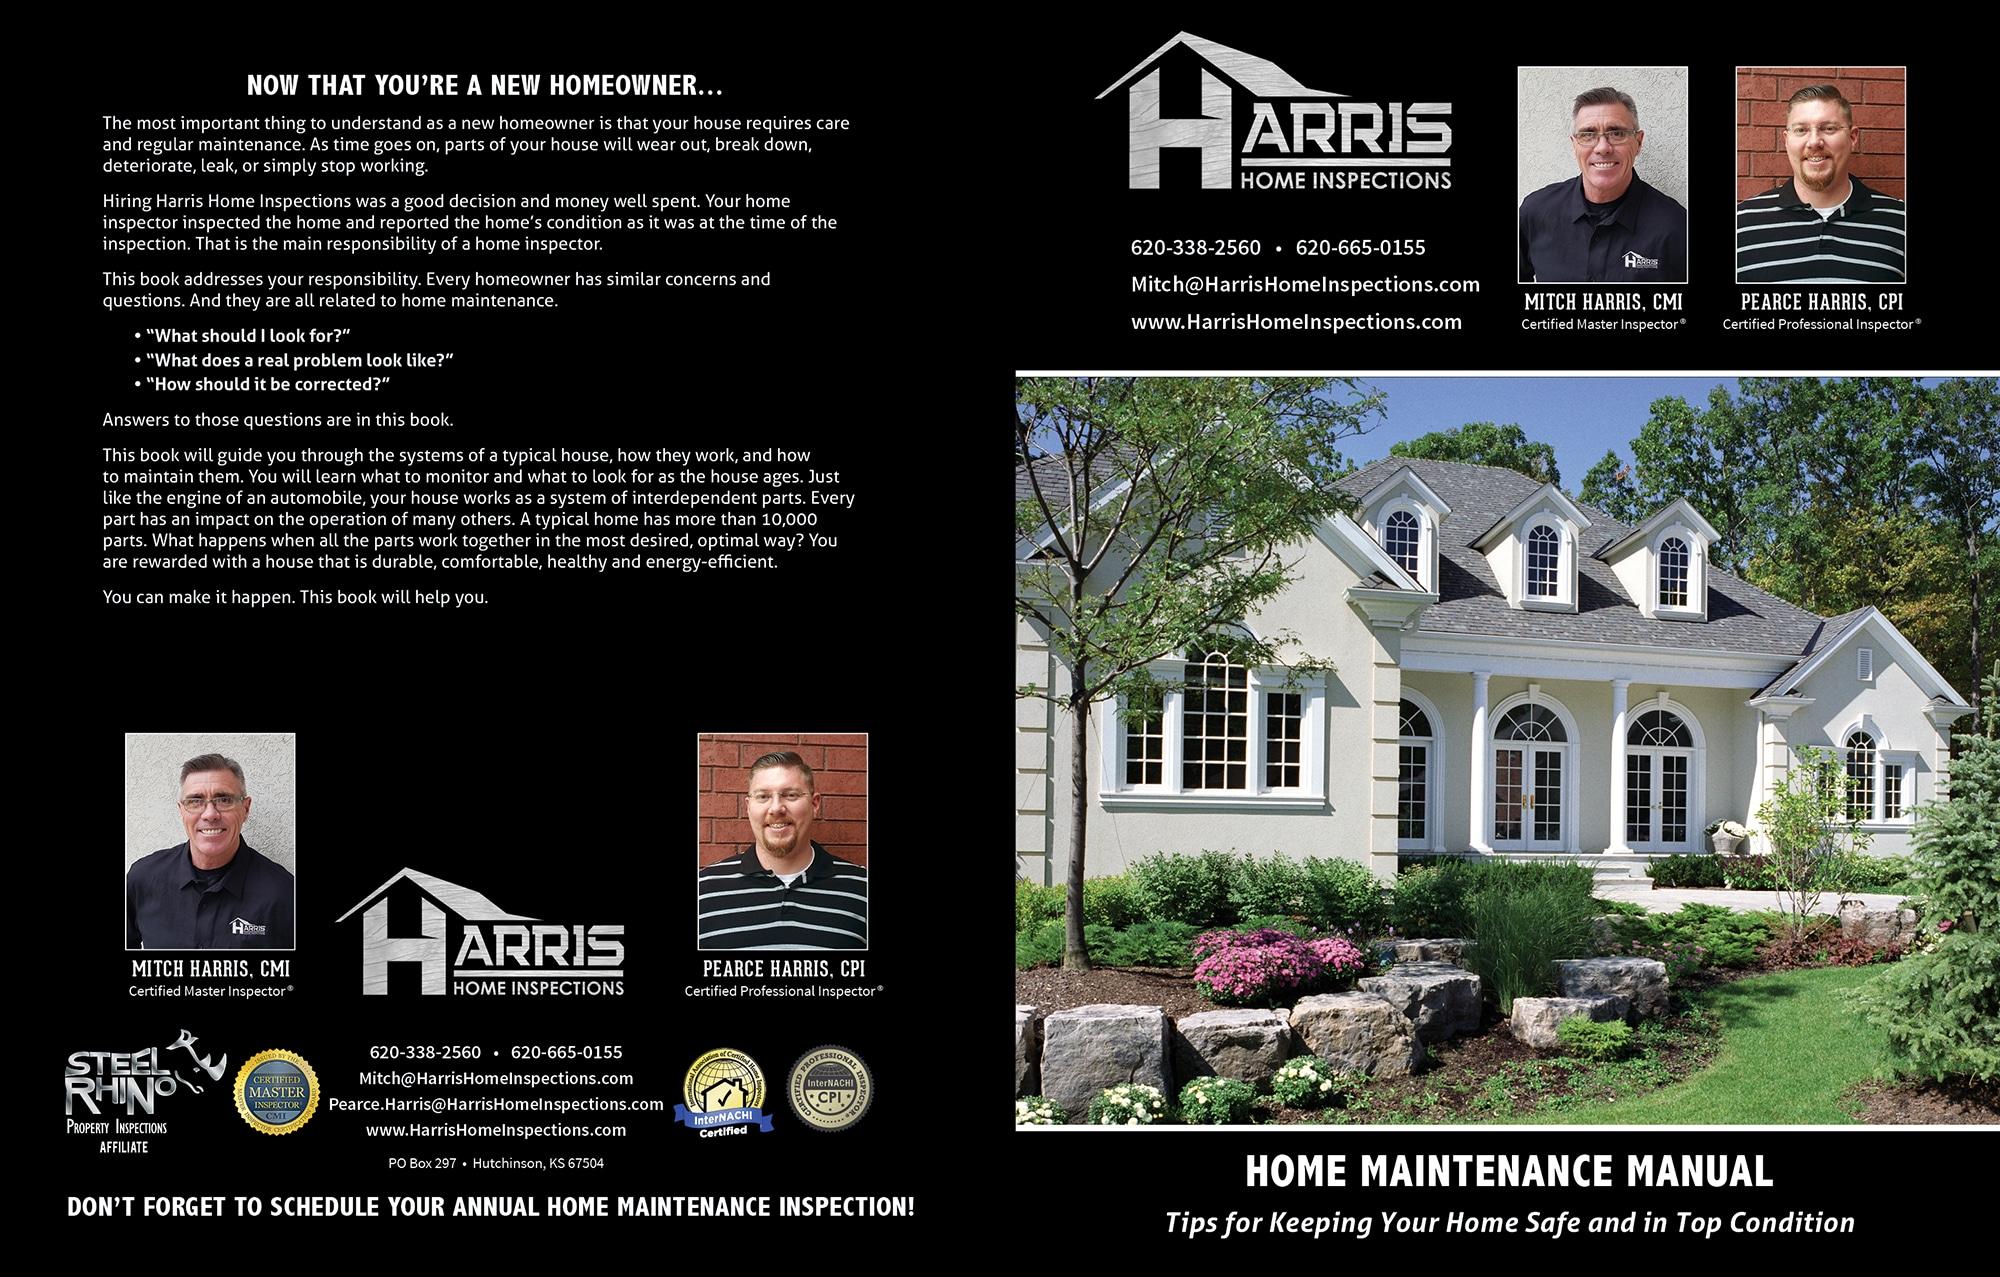 Custom Home Maintenance Book for Harris Home Inspections